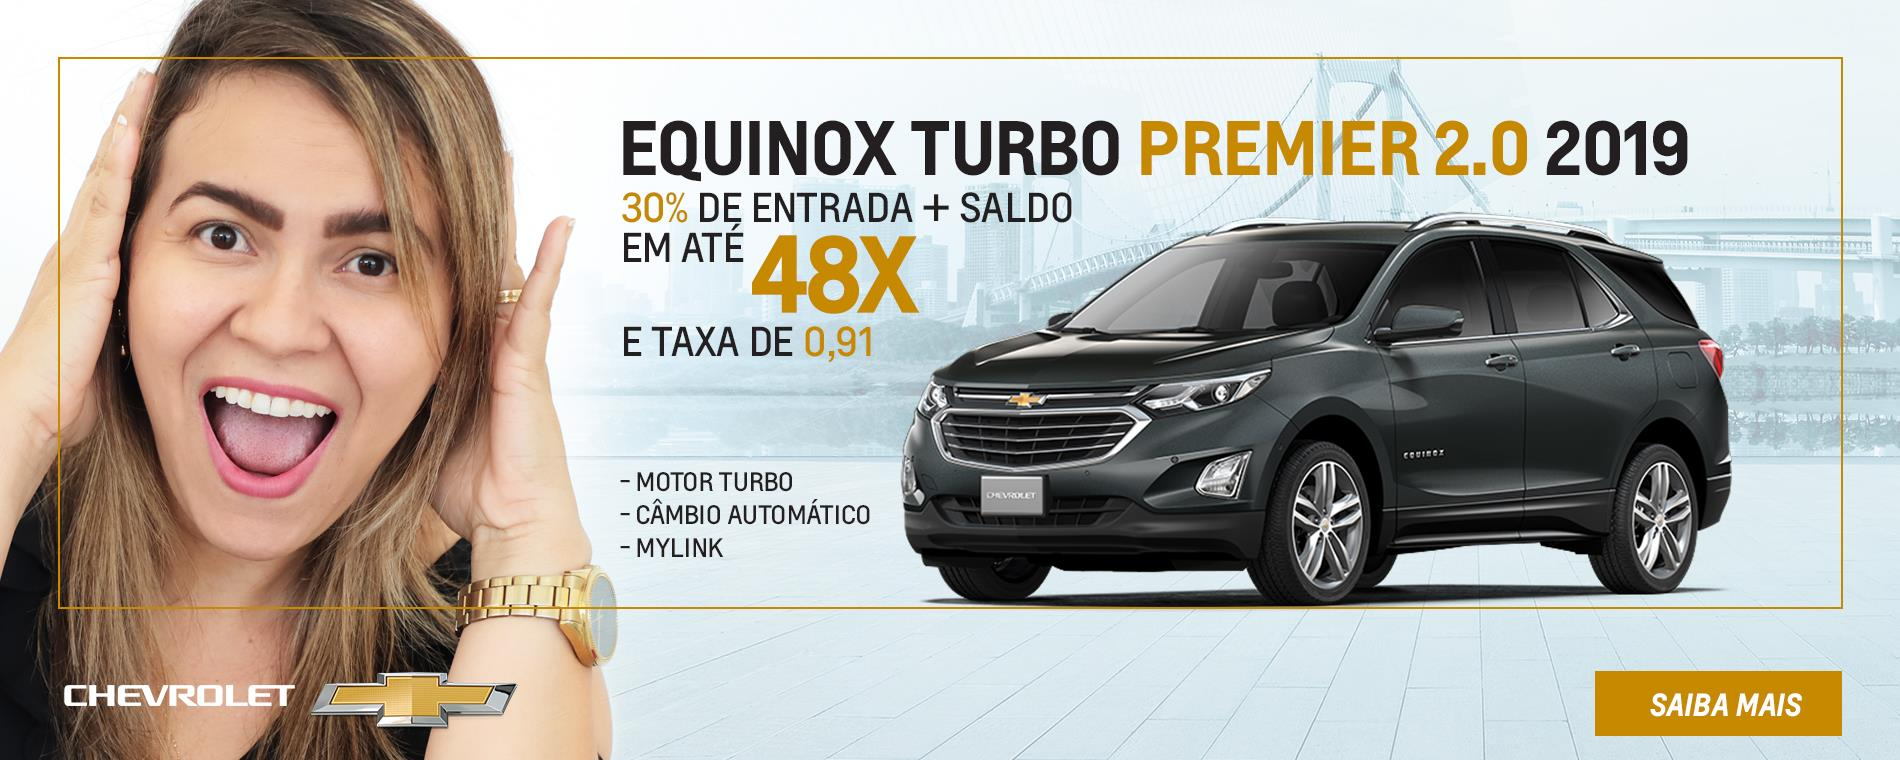 217_Mangabeiras-M80_Equinox-Turbo-Premier-2.0-2019_DestaqueDesk